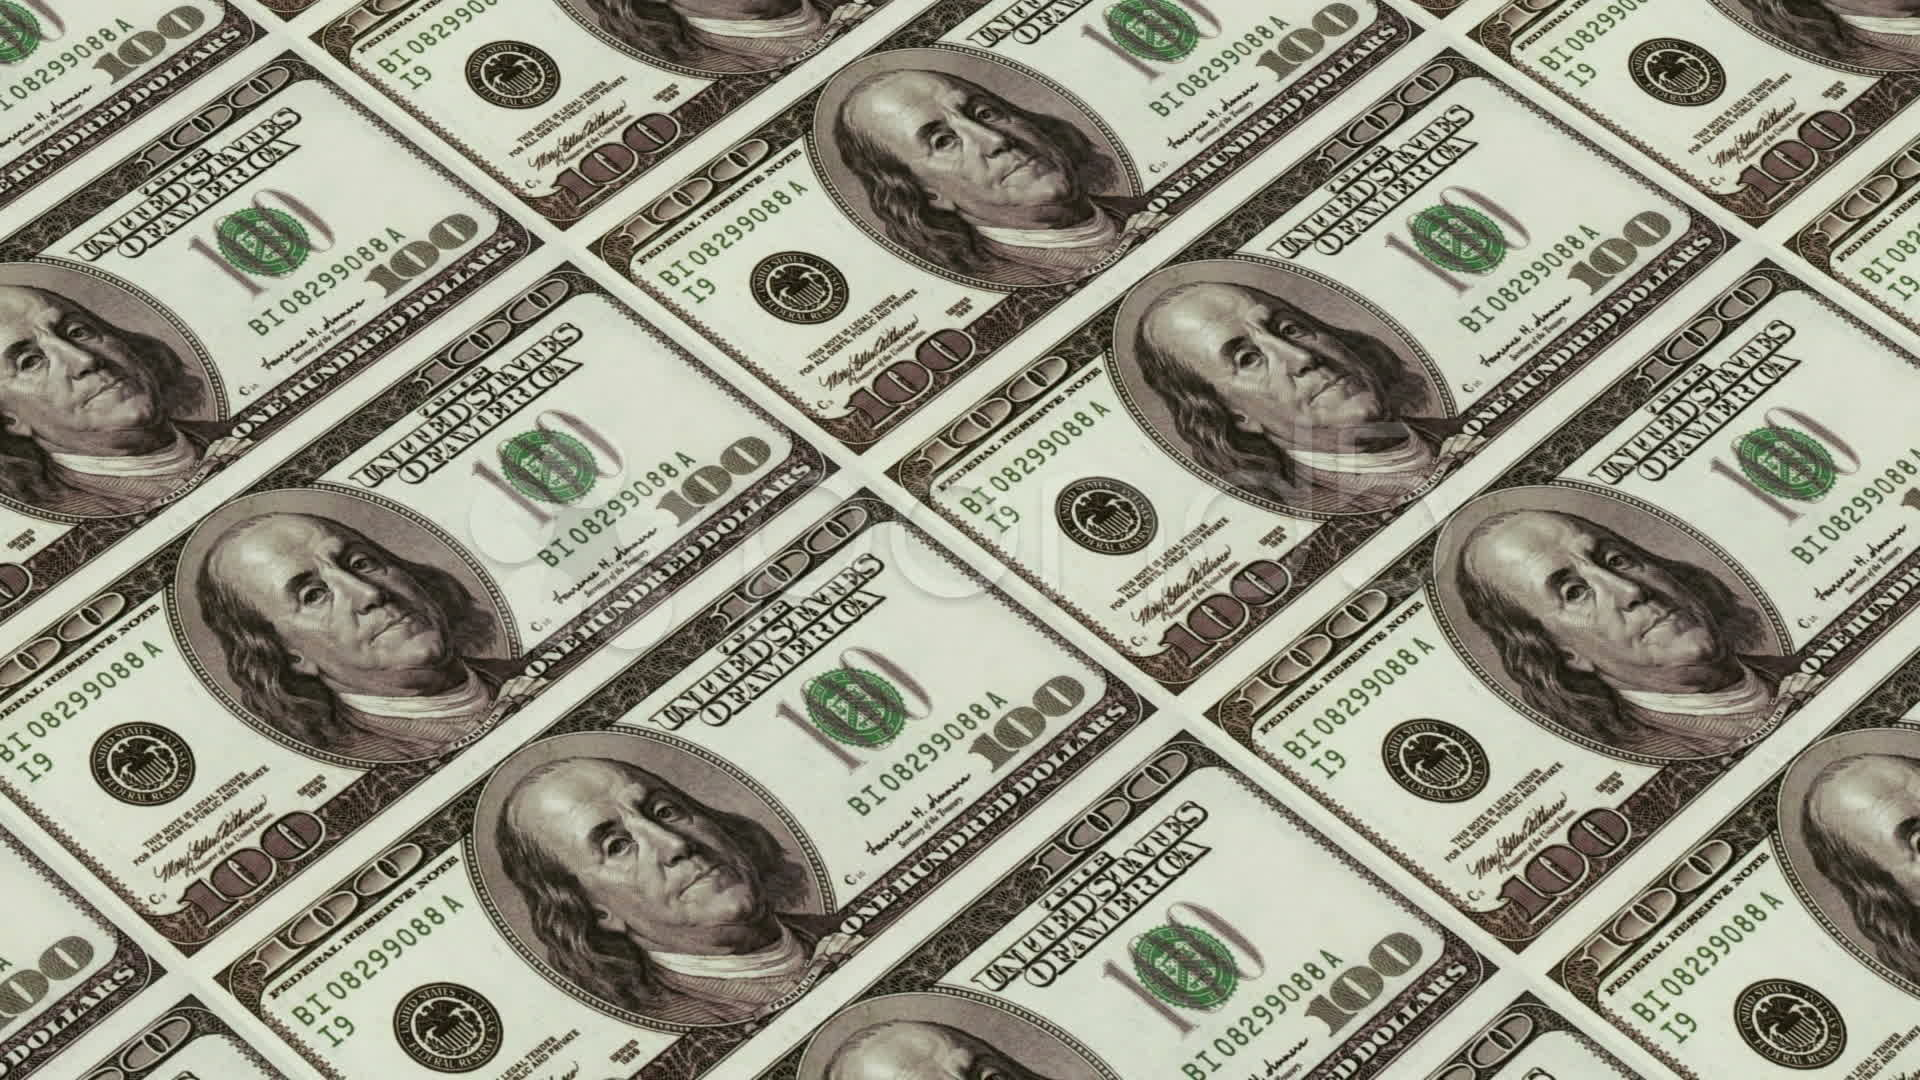 Printing Money Animation,100 Dollar Bills. videos 10734591 | HD .